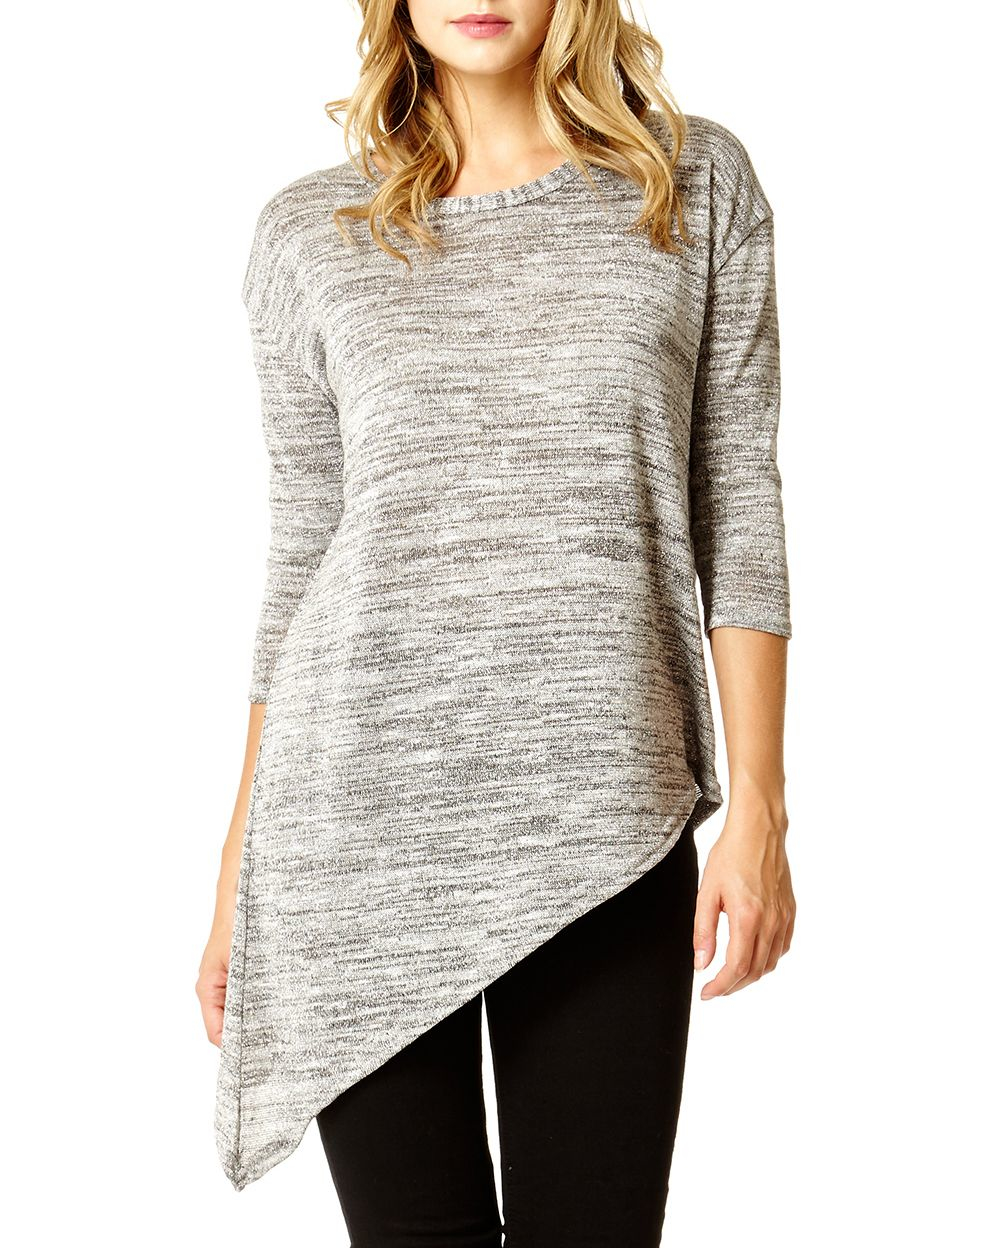 Knitting Quiz Uk : Lyst quiz grey silver knit top in gray